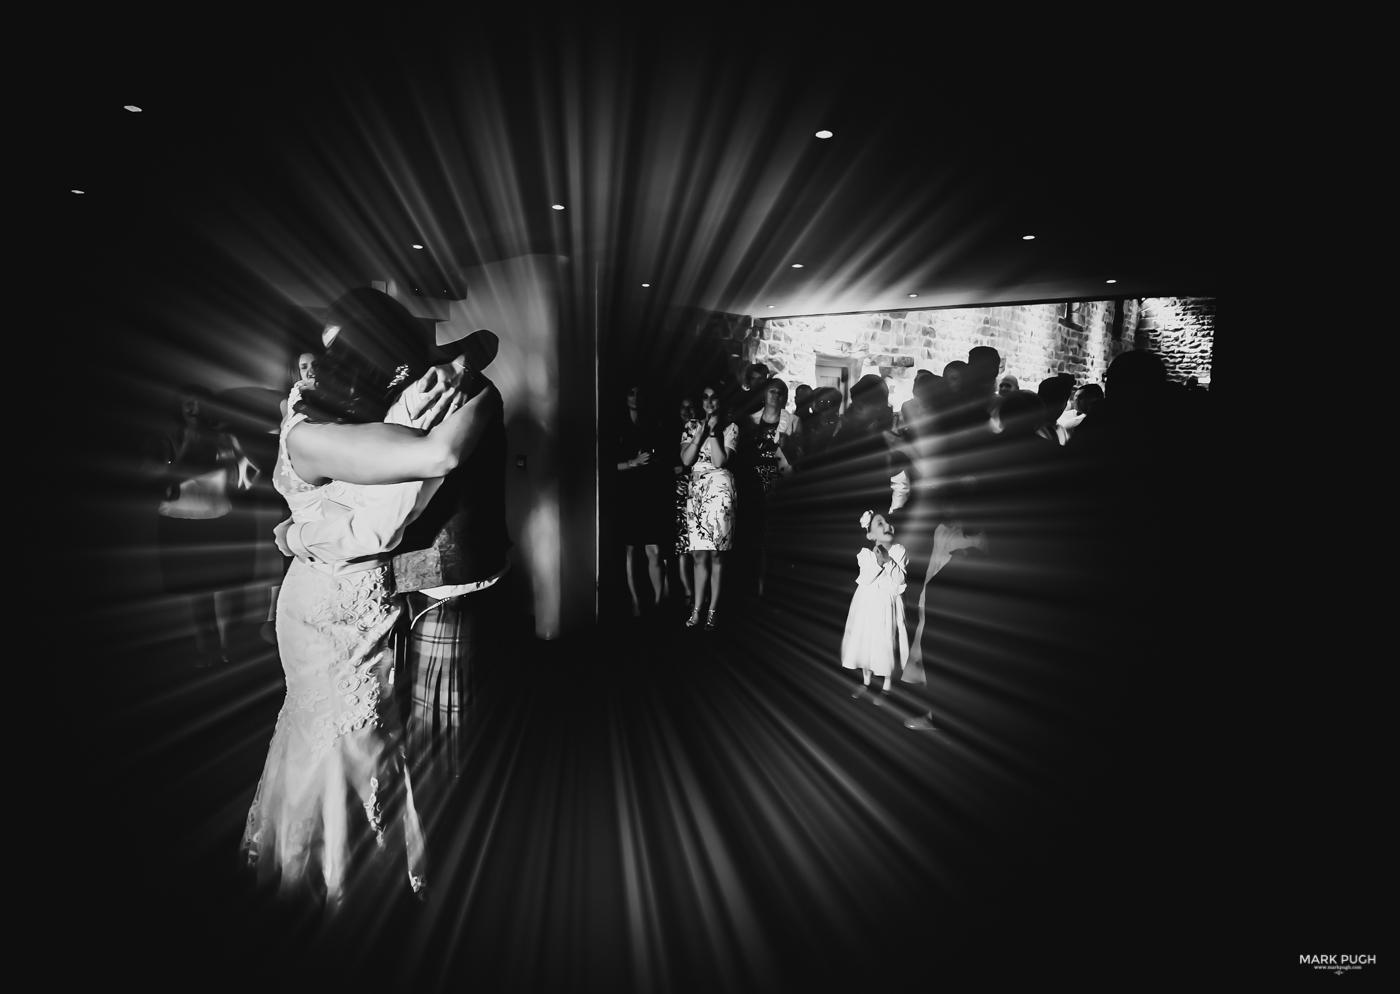 067 Wedding Photography Award winning Wedding Photographer and Videographer Mark Pugh www.markpugh.com.JPG